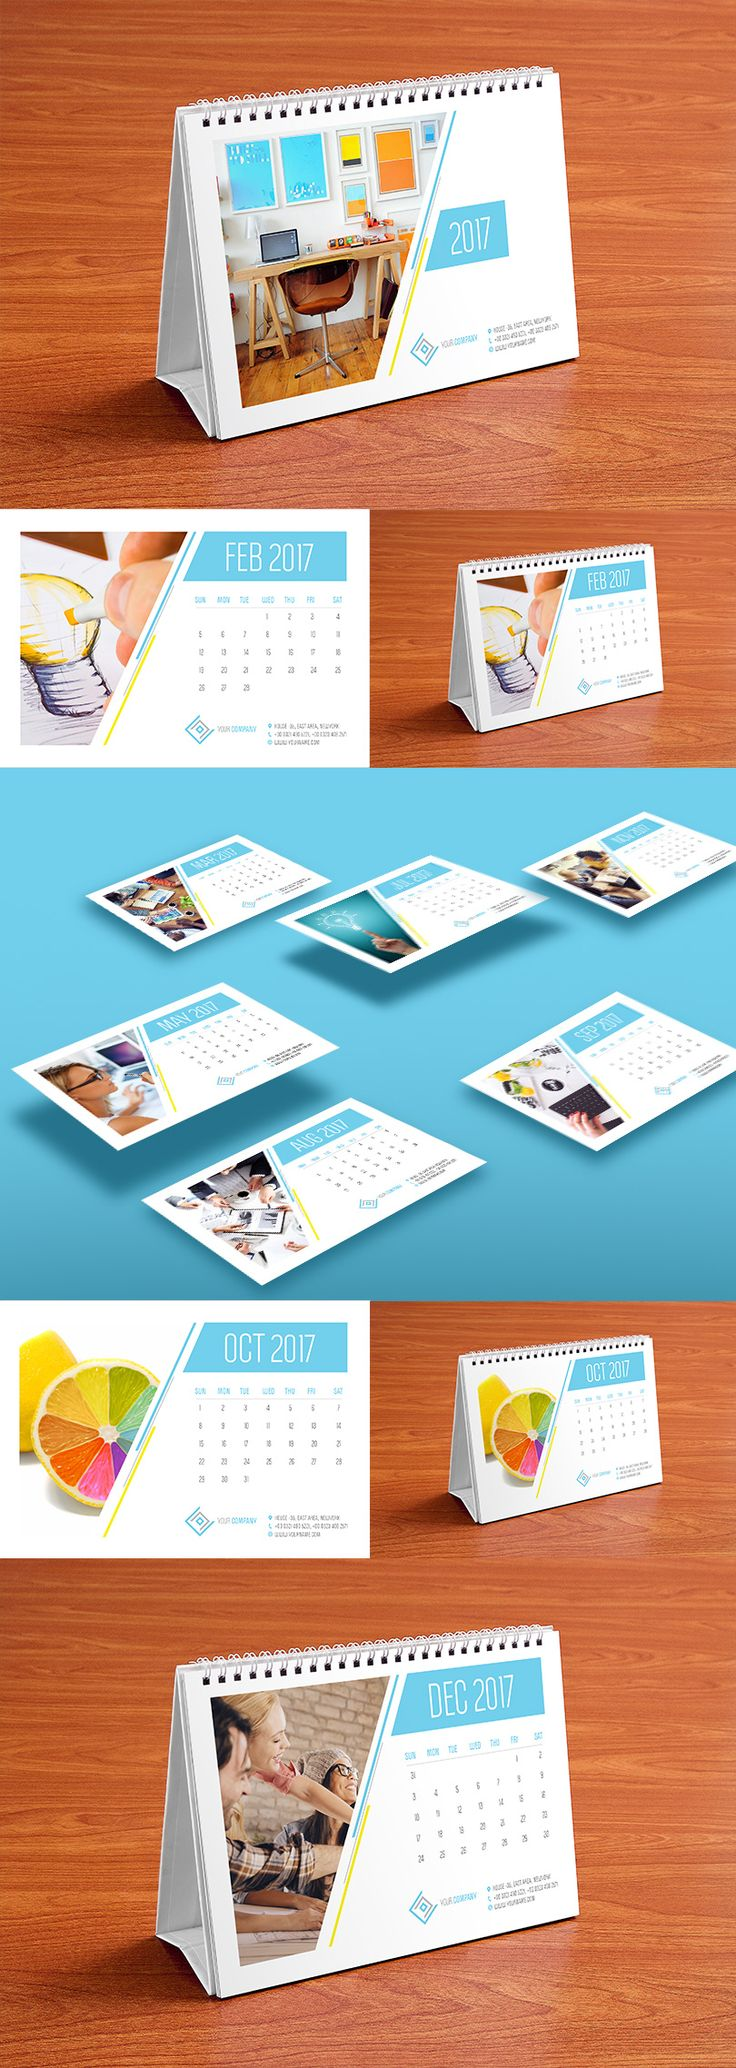 Table Calendar Design Template and Mock-up PSD 2017